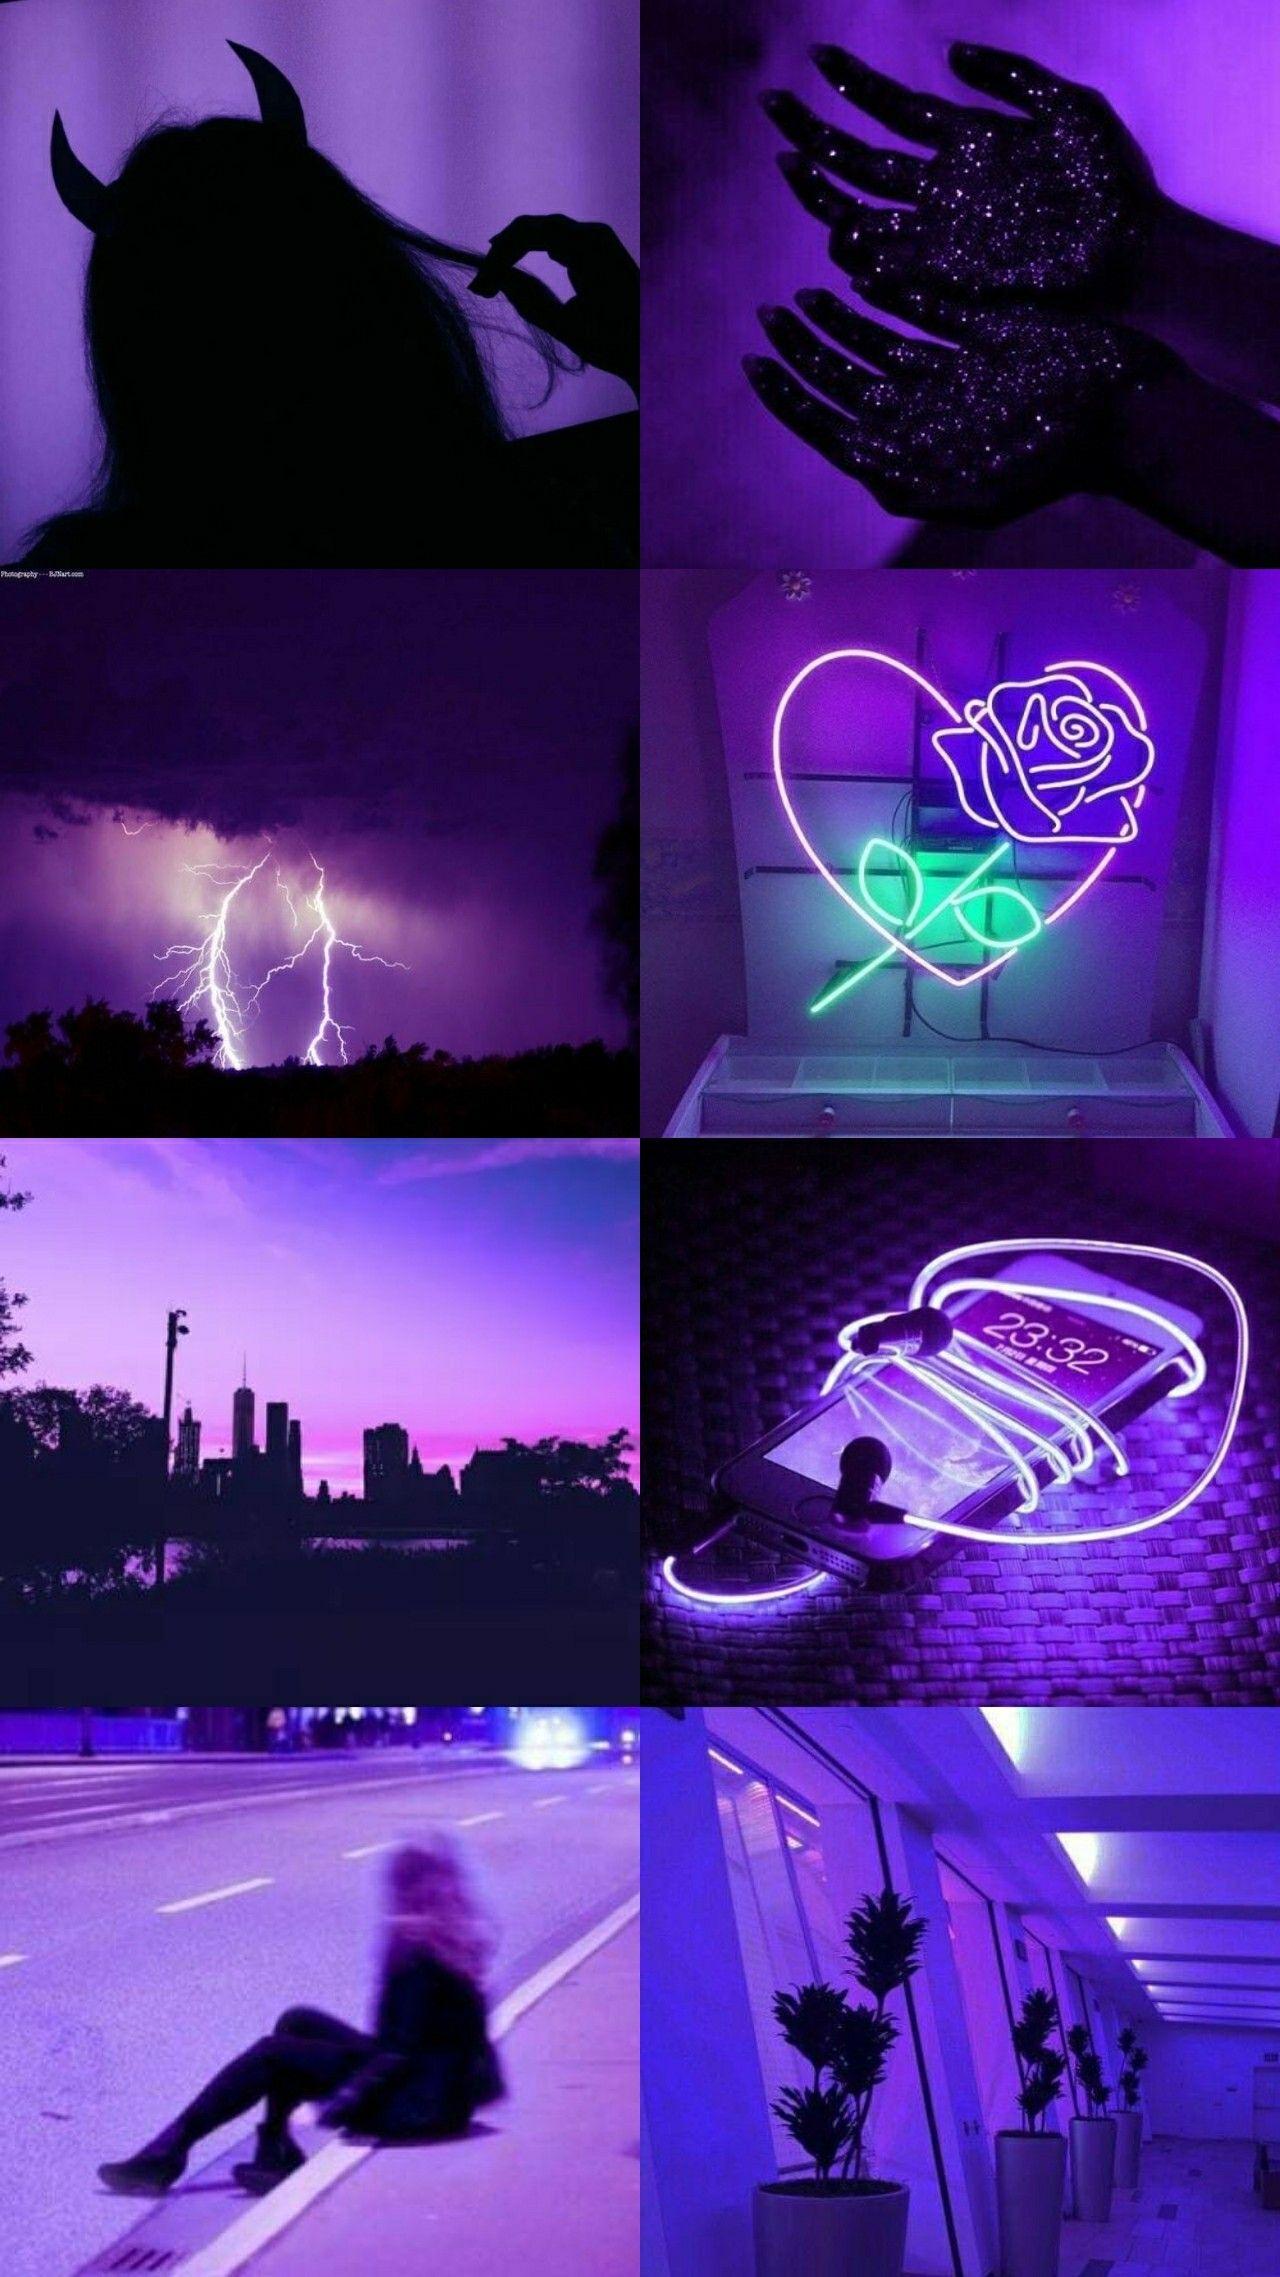 Wallpaper Aesthetic Dark Purple (With images) Dark